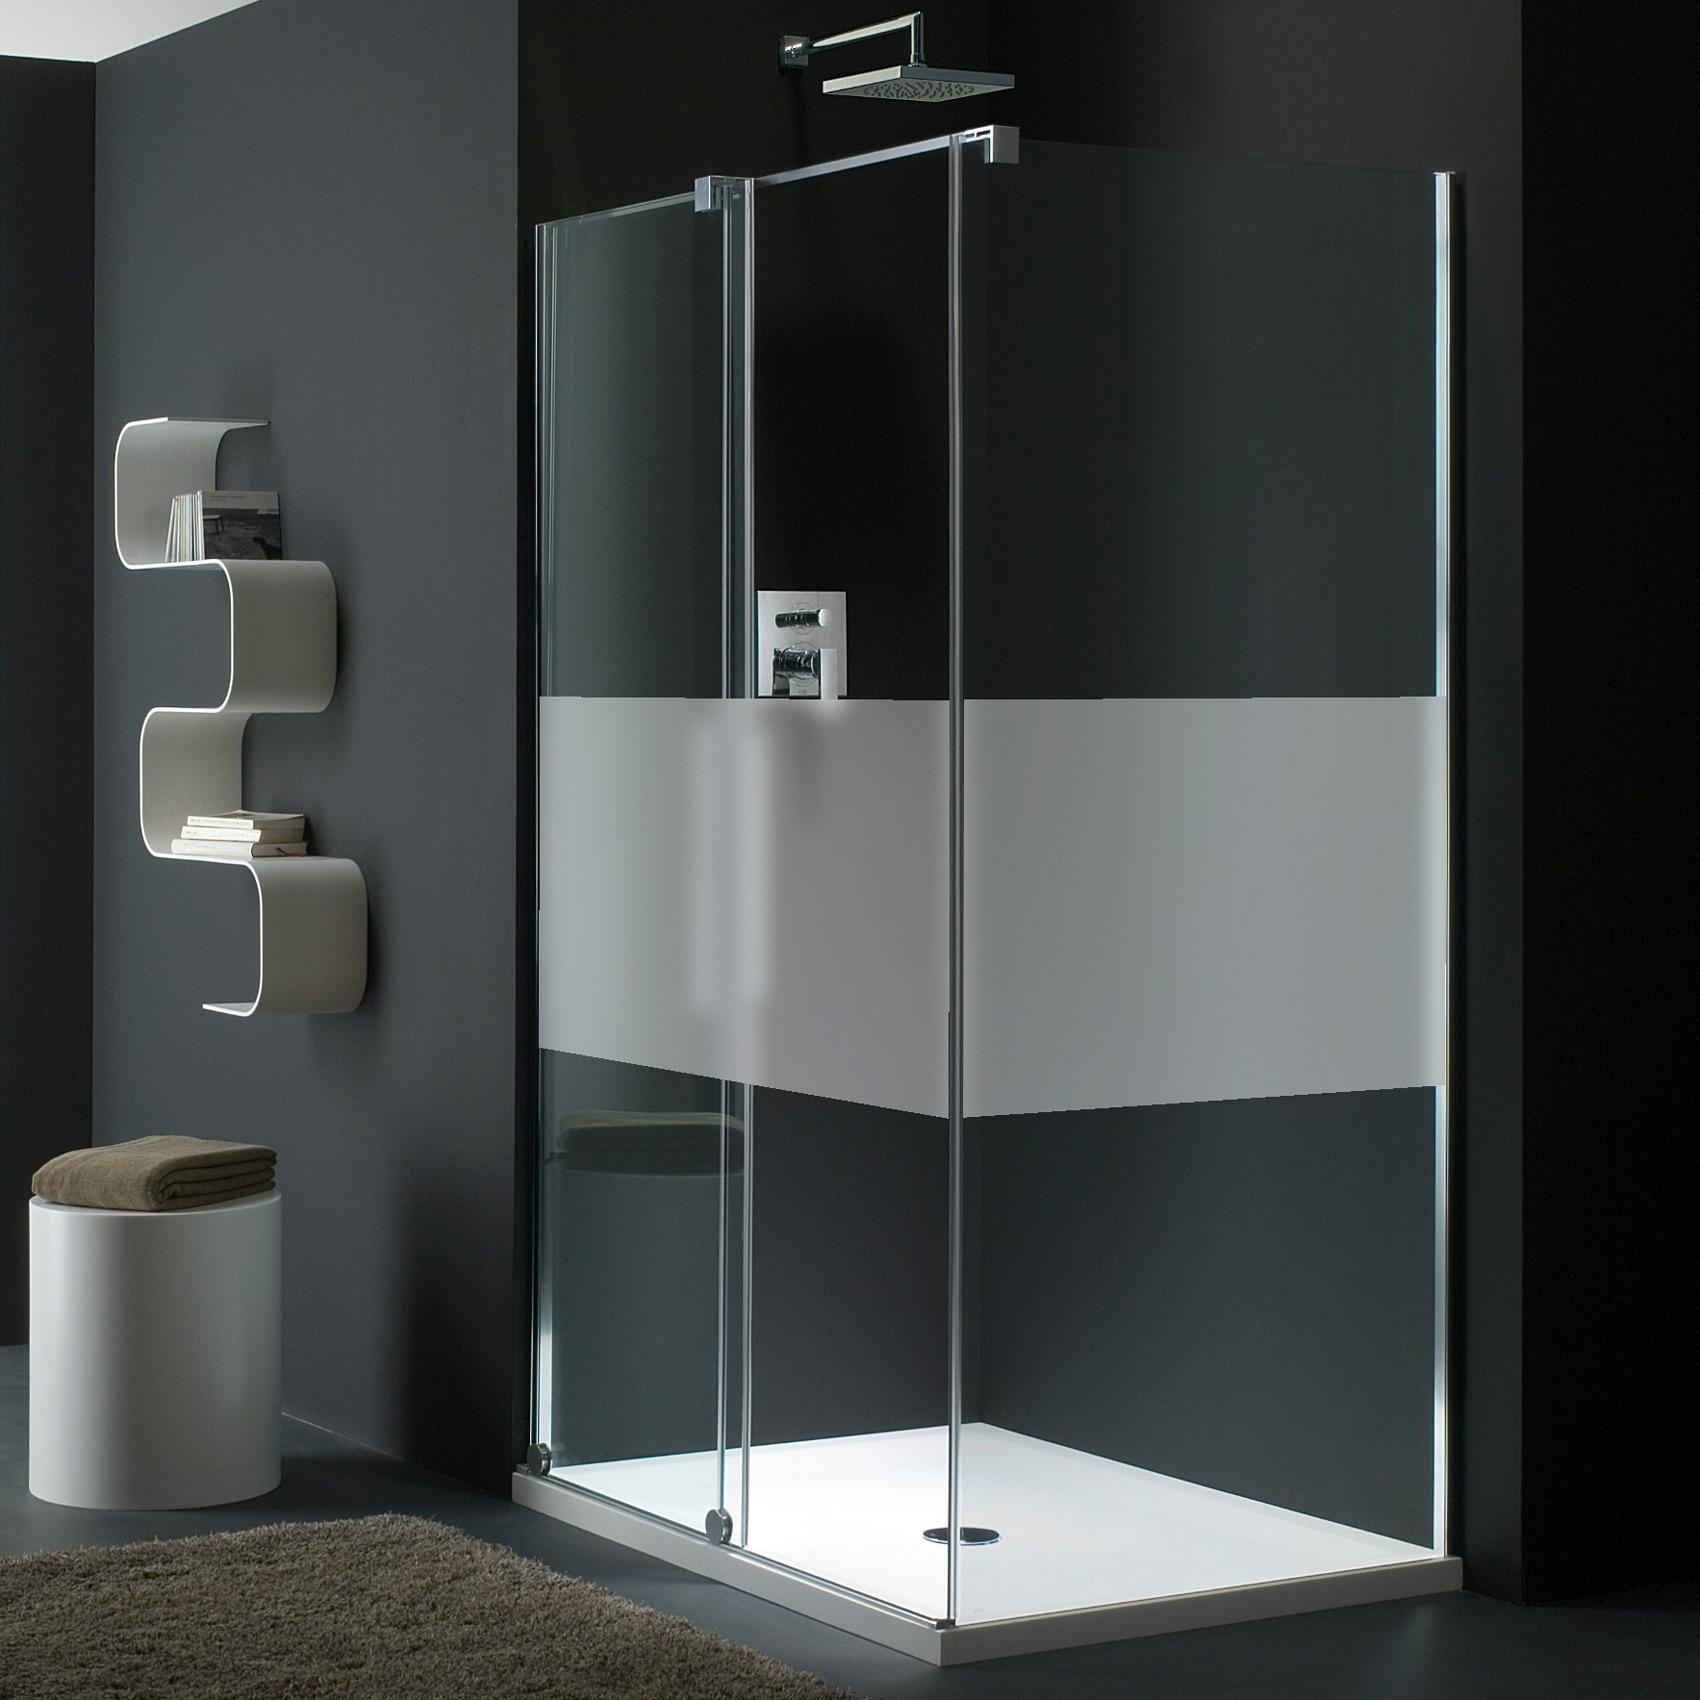 sticker porte de douche personnalisable bande unie stickers salle de bain porte de douche. Black Bedroom Furniture Sets. Home Design Ideas